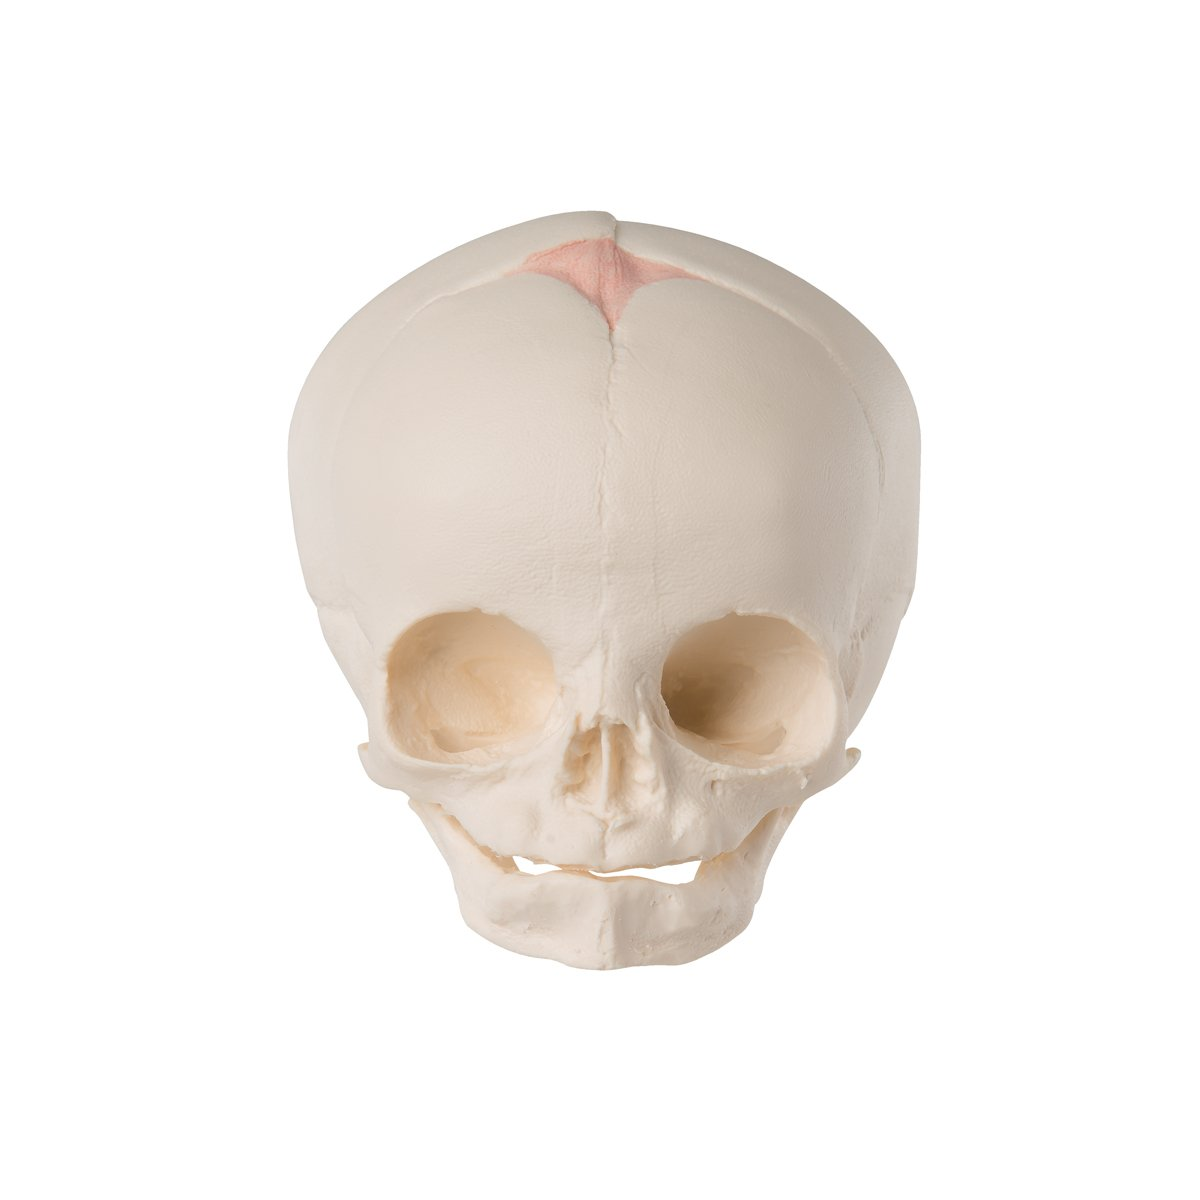 Buy 3B Scientific Fetal Skull Online at Low Prices in India - Amazon.in